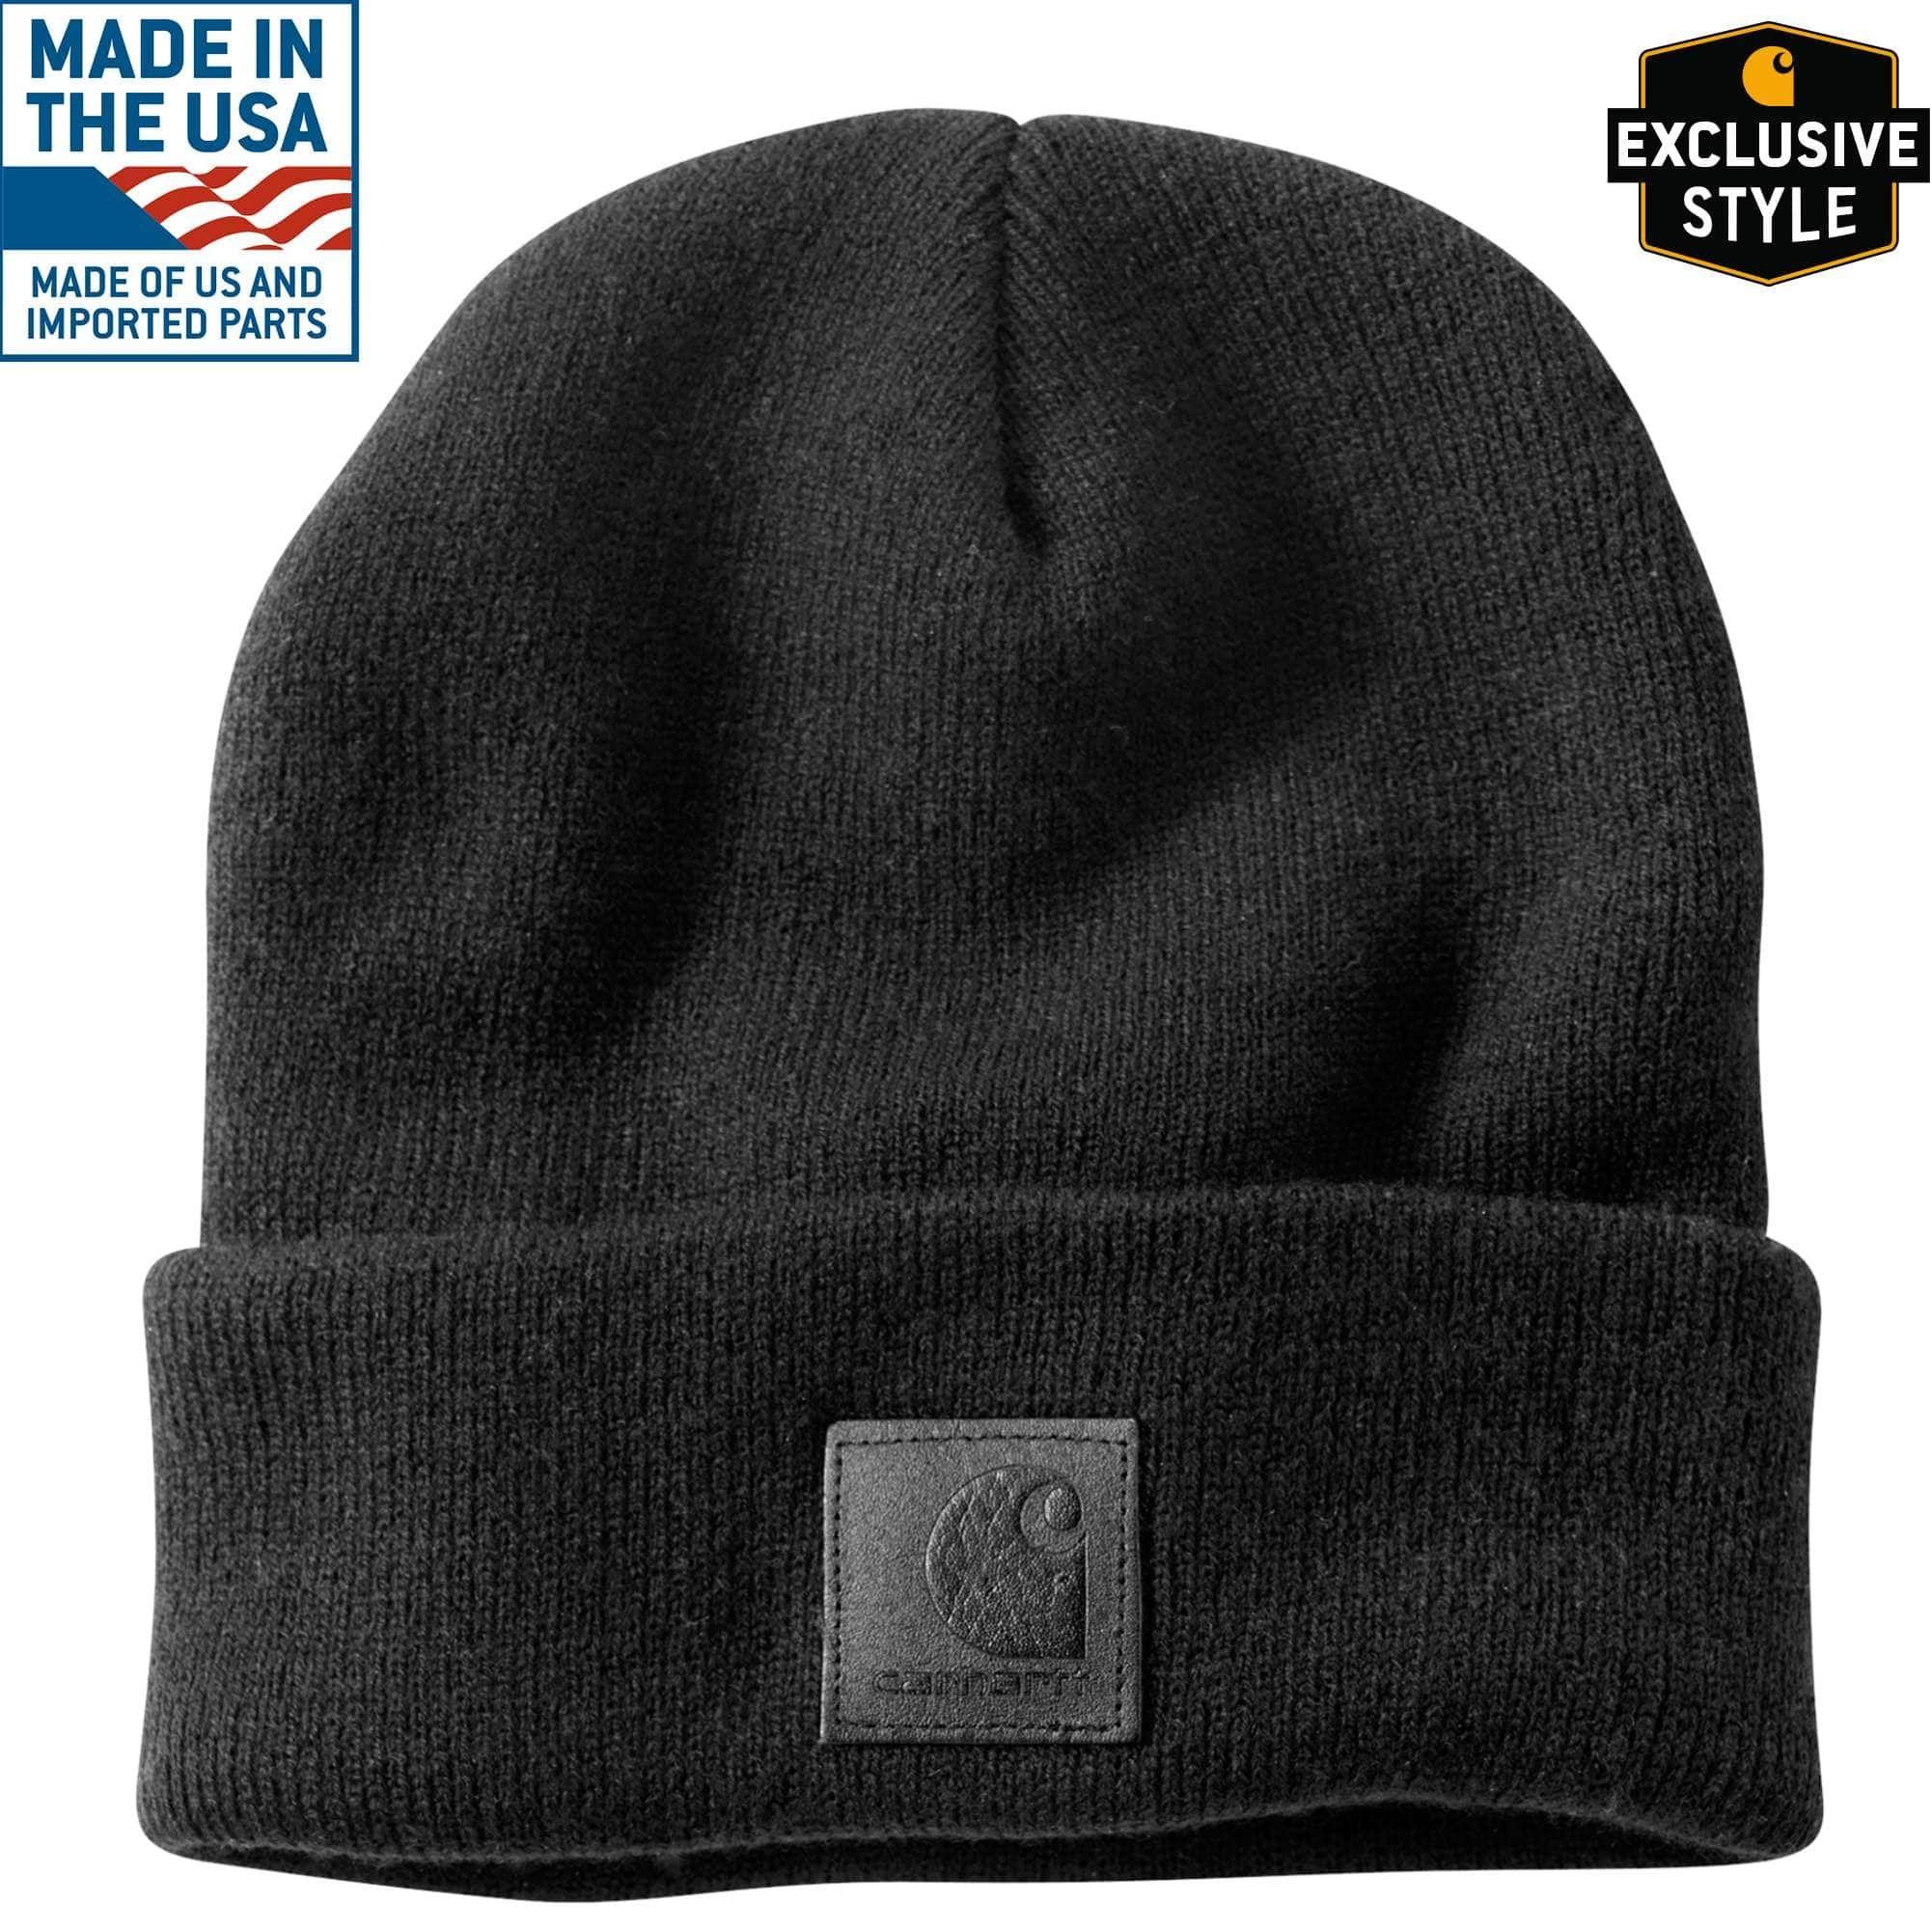 Bone Mens Winter Hat Knitted Wool Beanies Men Hip-Hop Cap Urban Caps Skullies Hats for Women